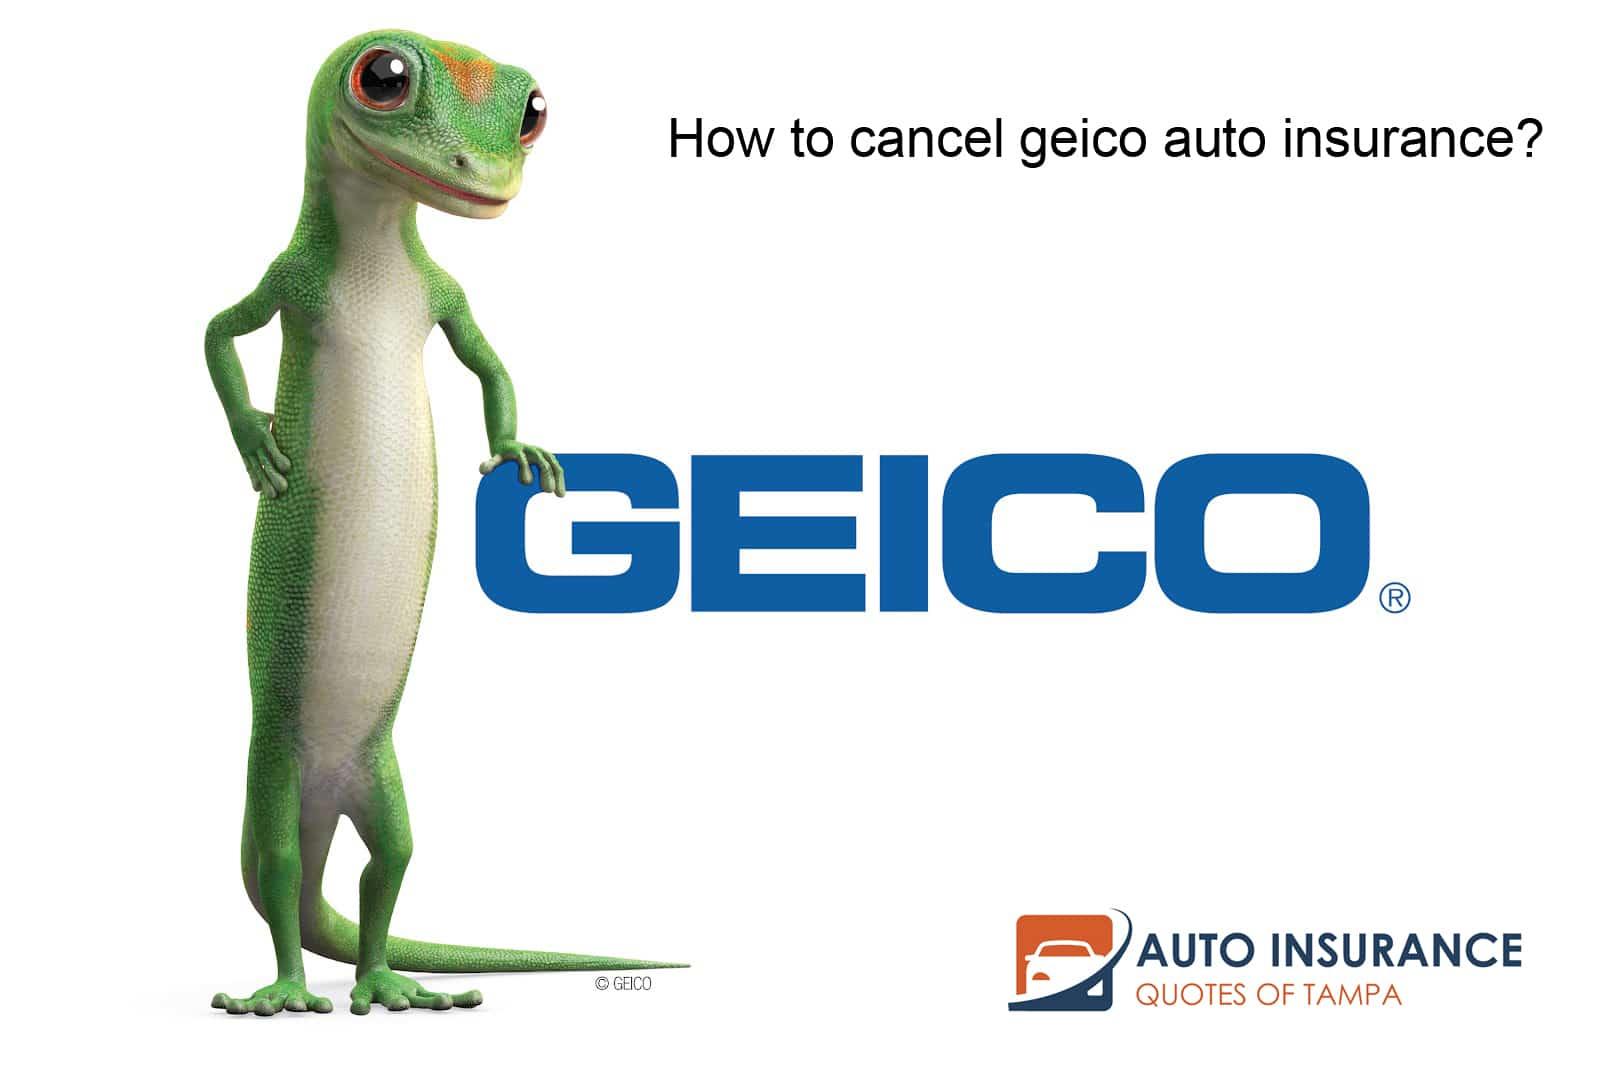 How to cancel geico auto insurance